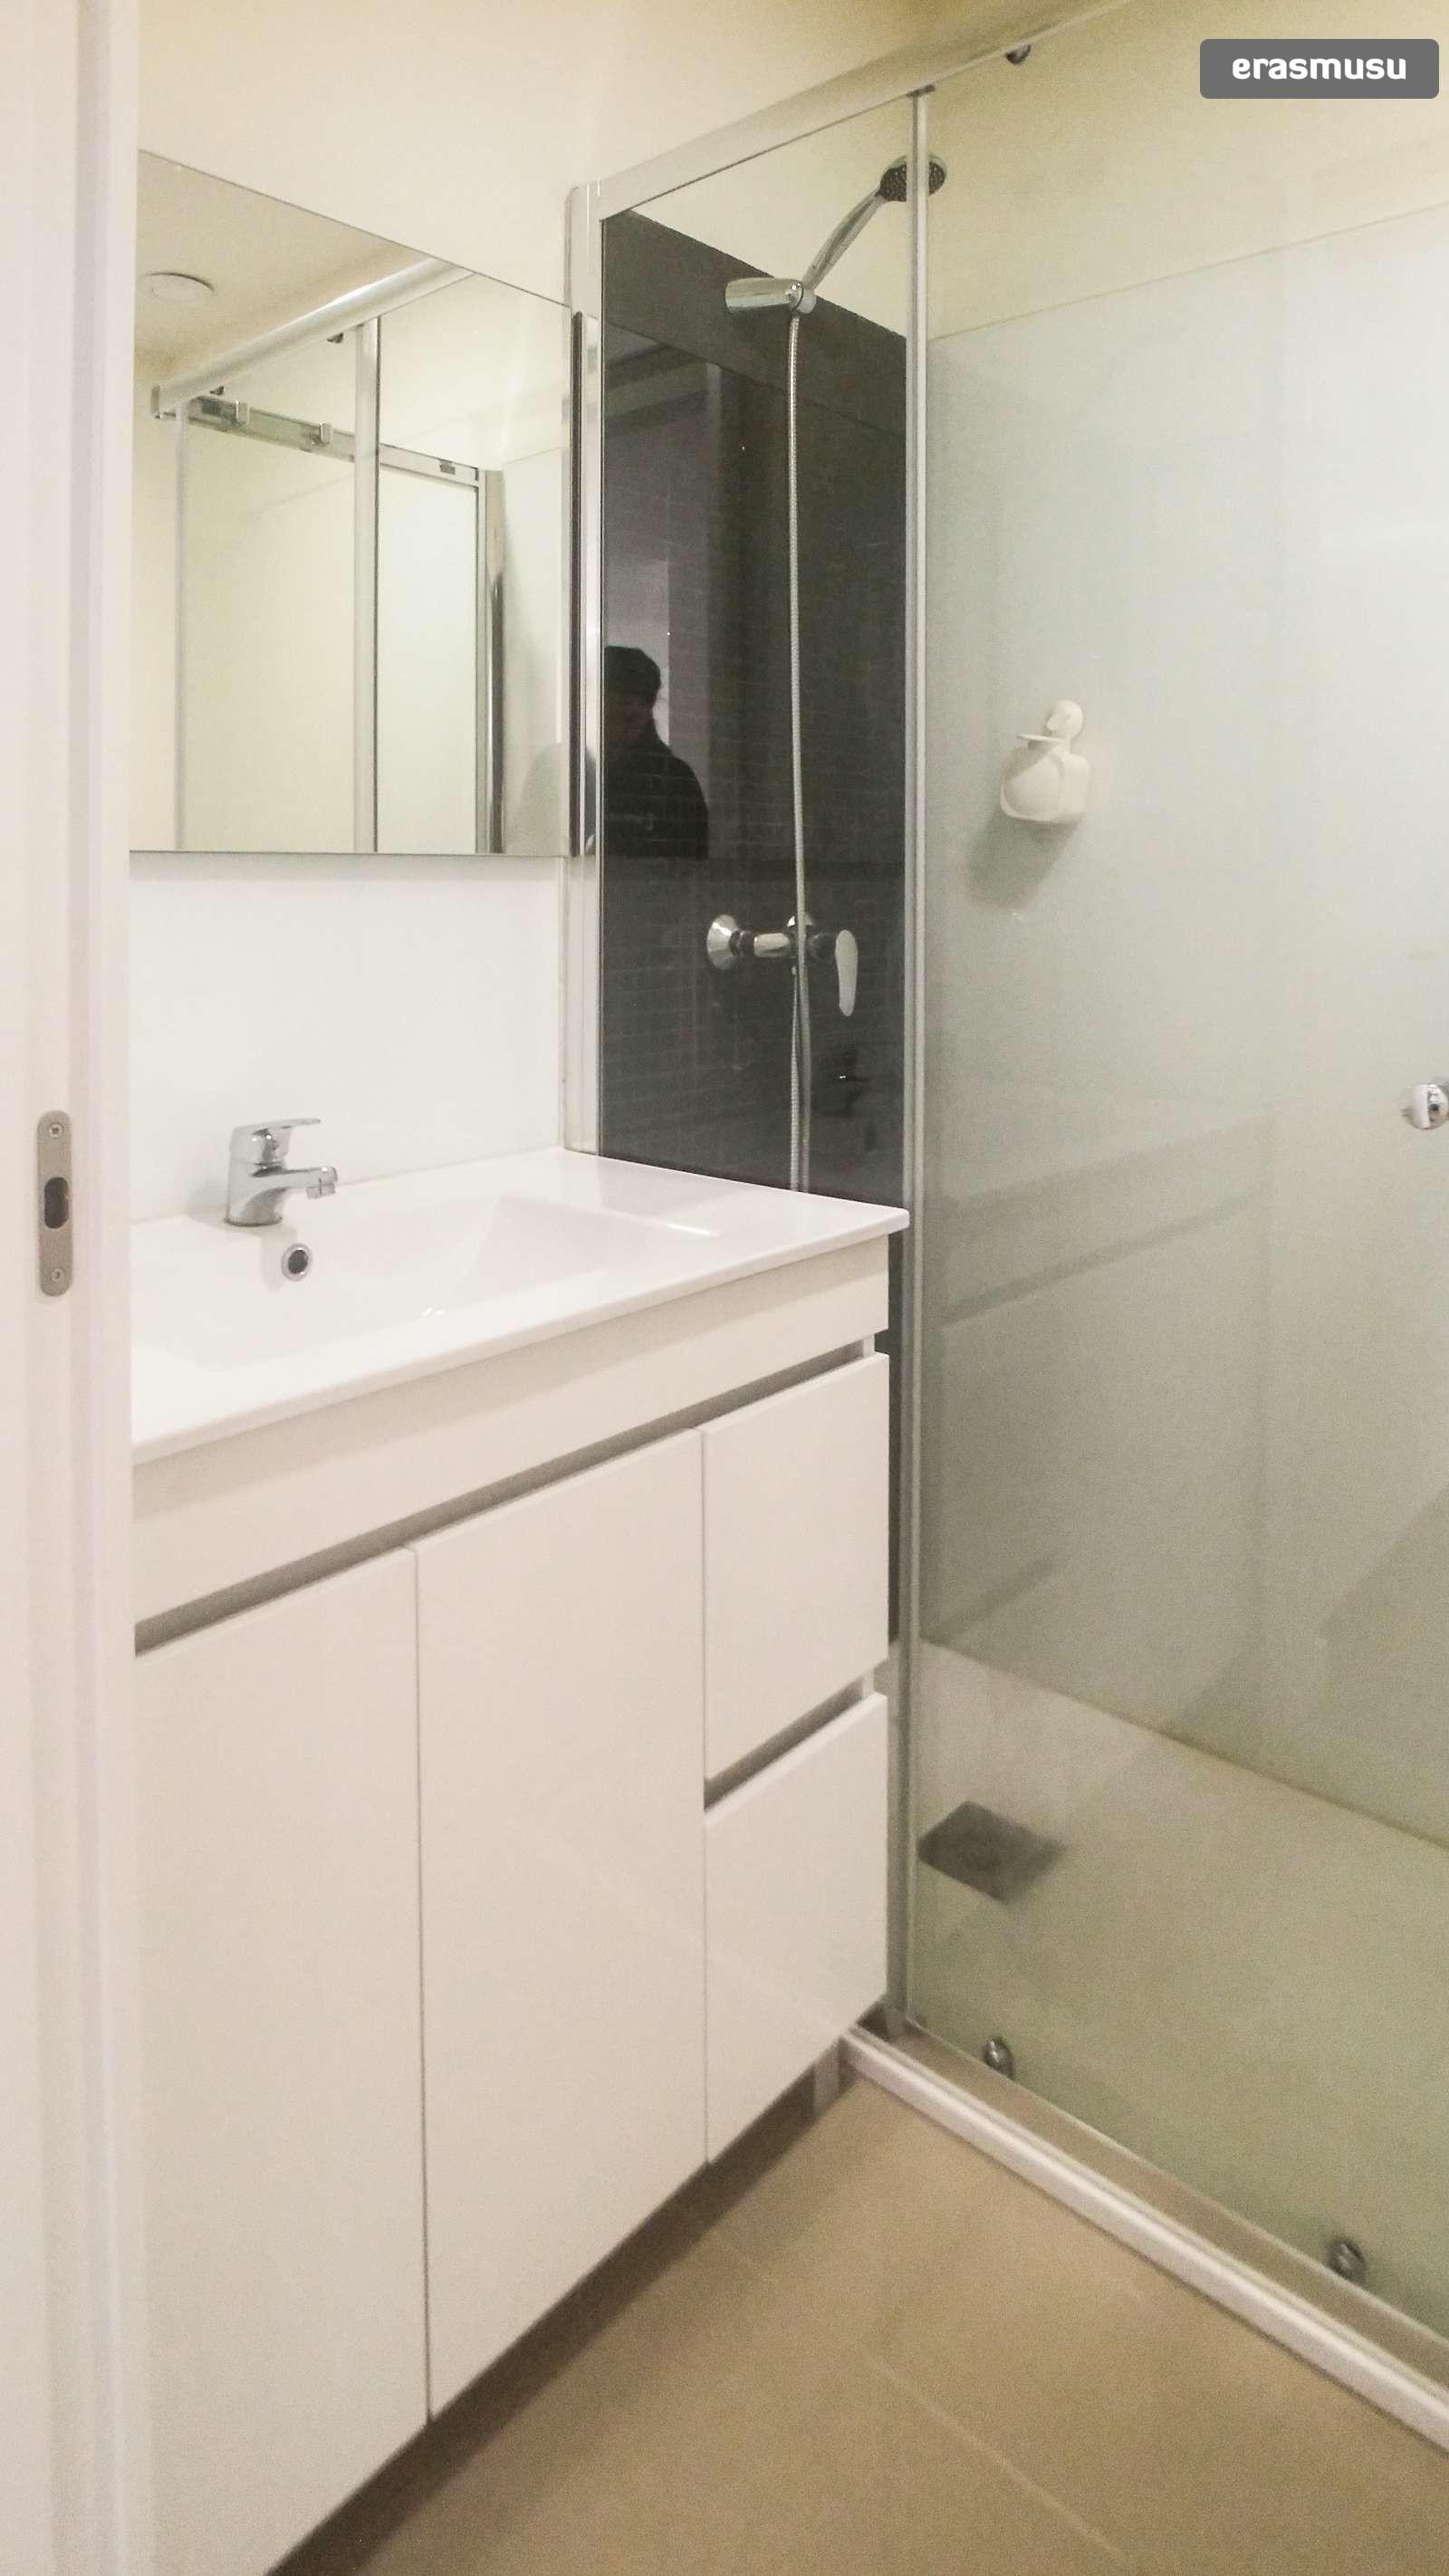 1-bedroom-apartment-rent-santo-ildefonso-ae1edefabdff90ac0d0b3ab